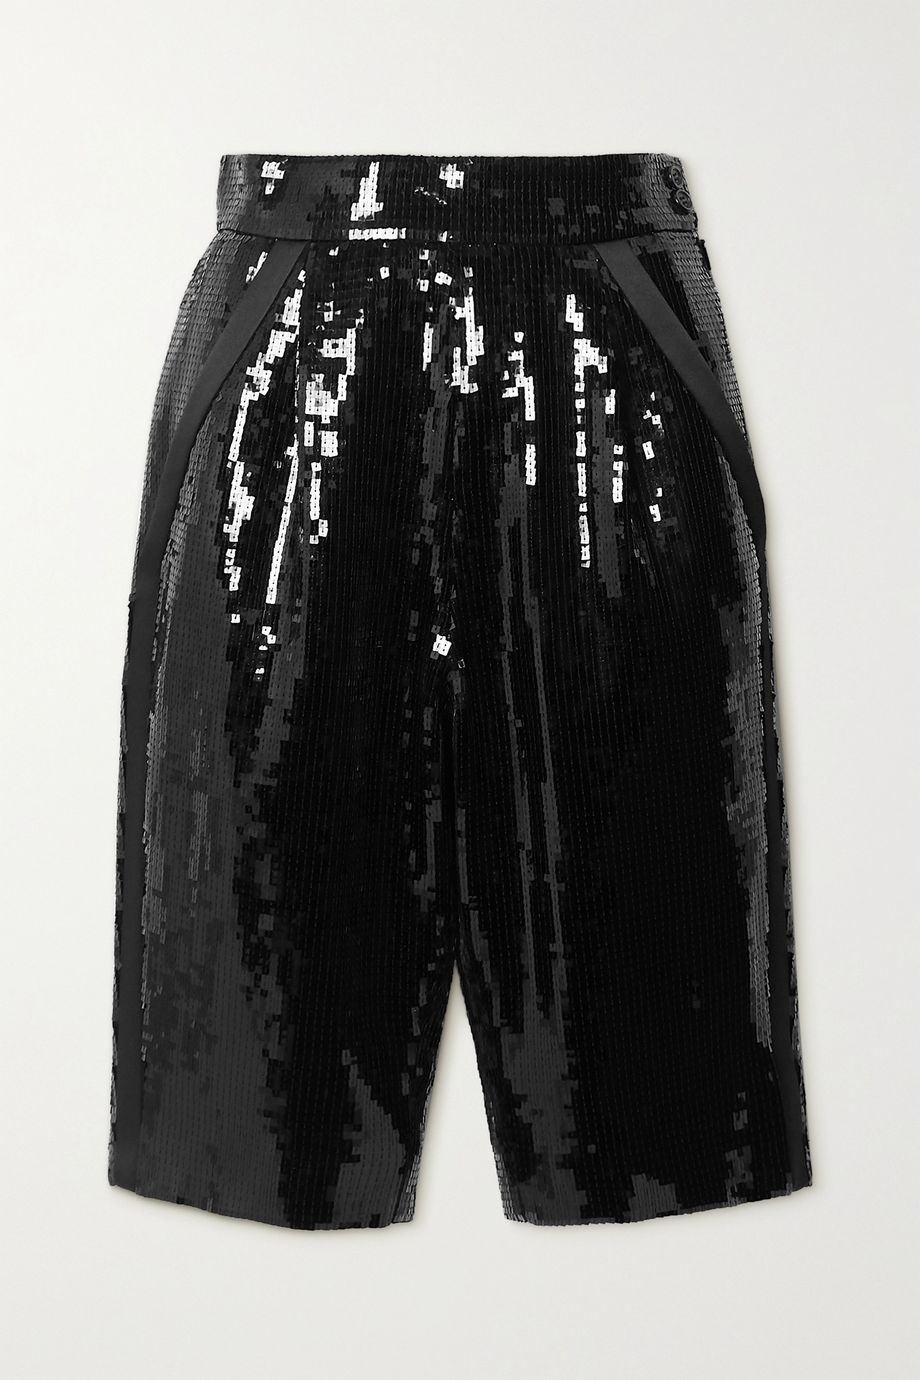 SAINT LAURENT Satin-trimmed sequined crepe shorts